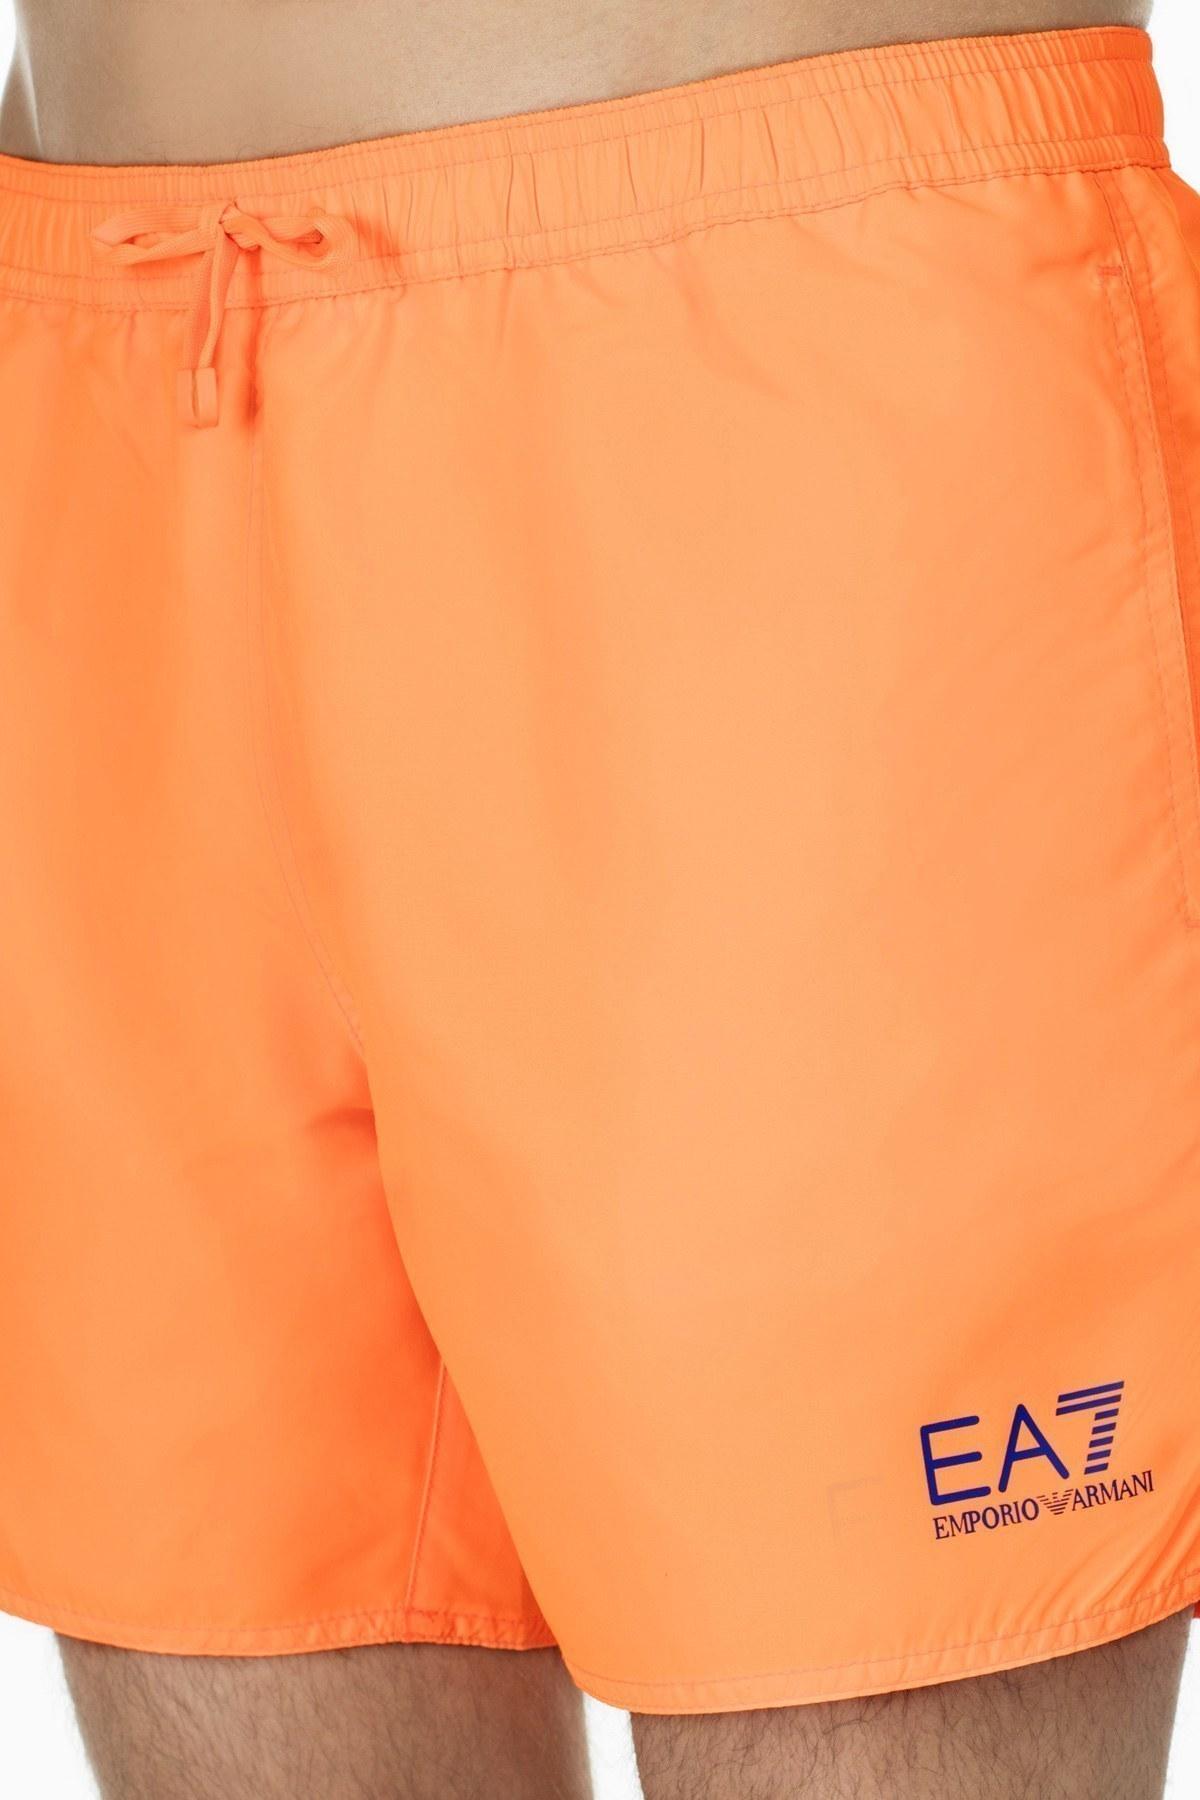 EA7 Erkek Mayo Short S 902000 9P740 00662 TURUNCU